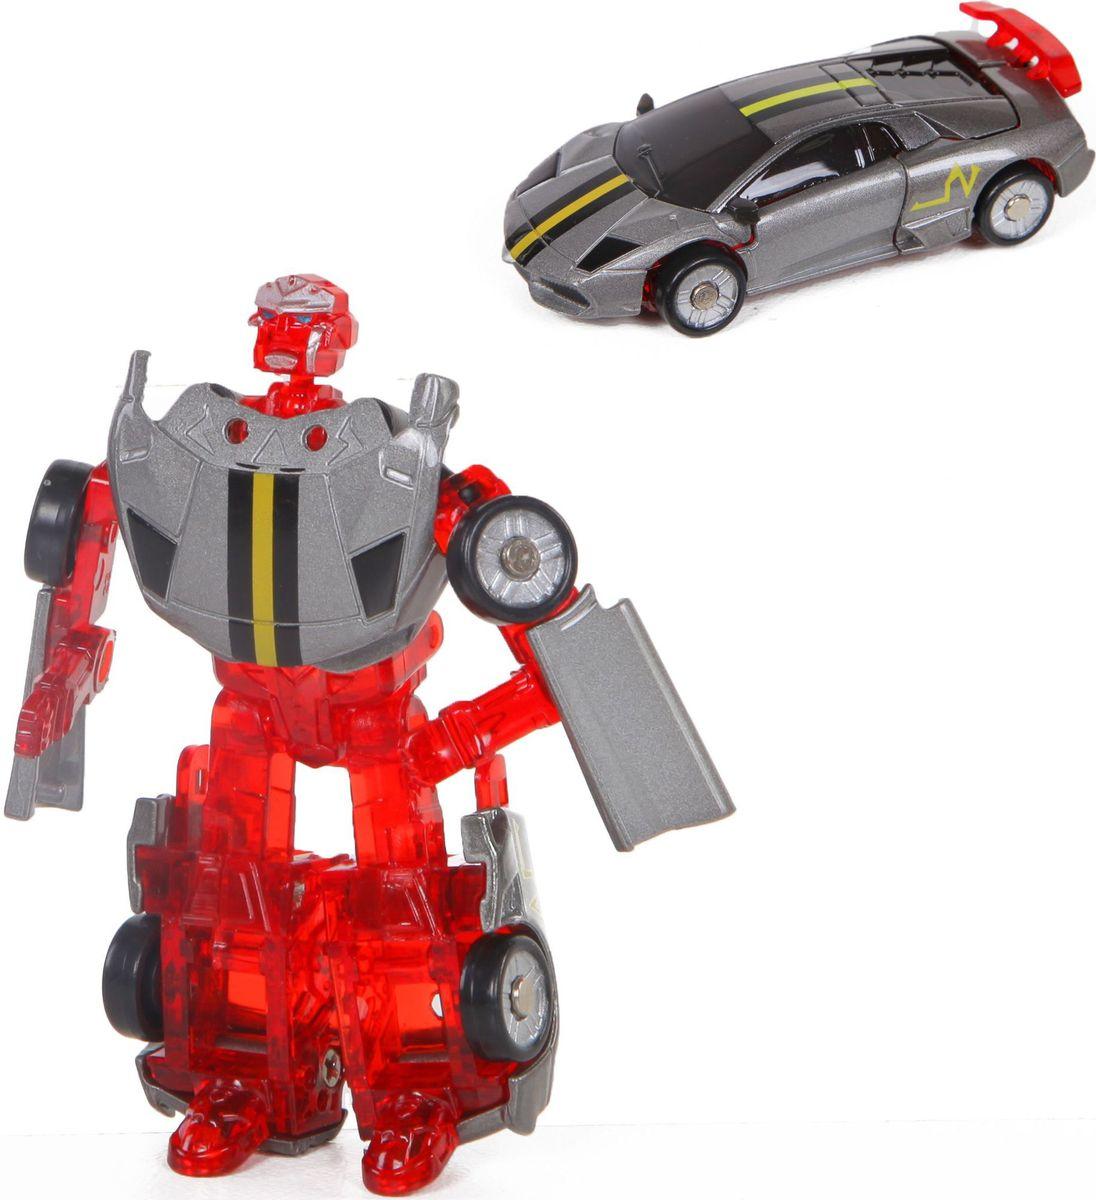 Yako Робот-трансформер цвет красный серый Y3686091-2 кукла yako m6579 6